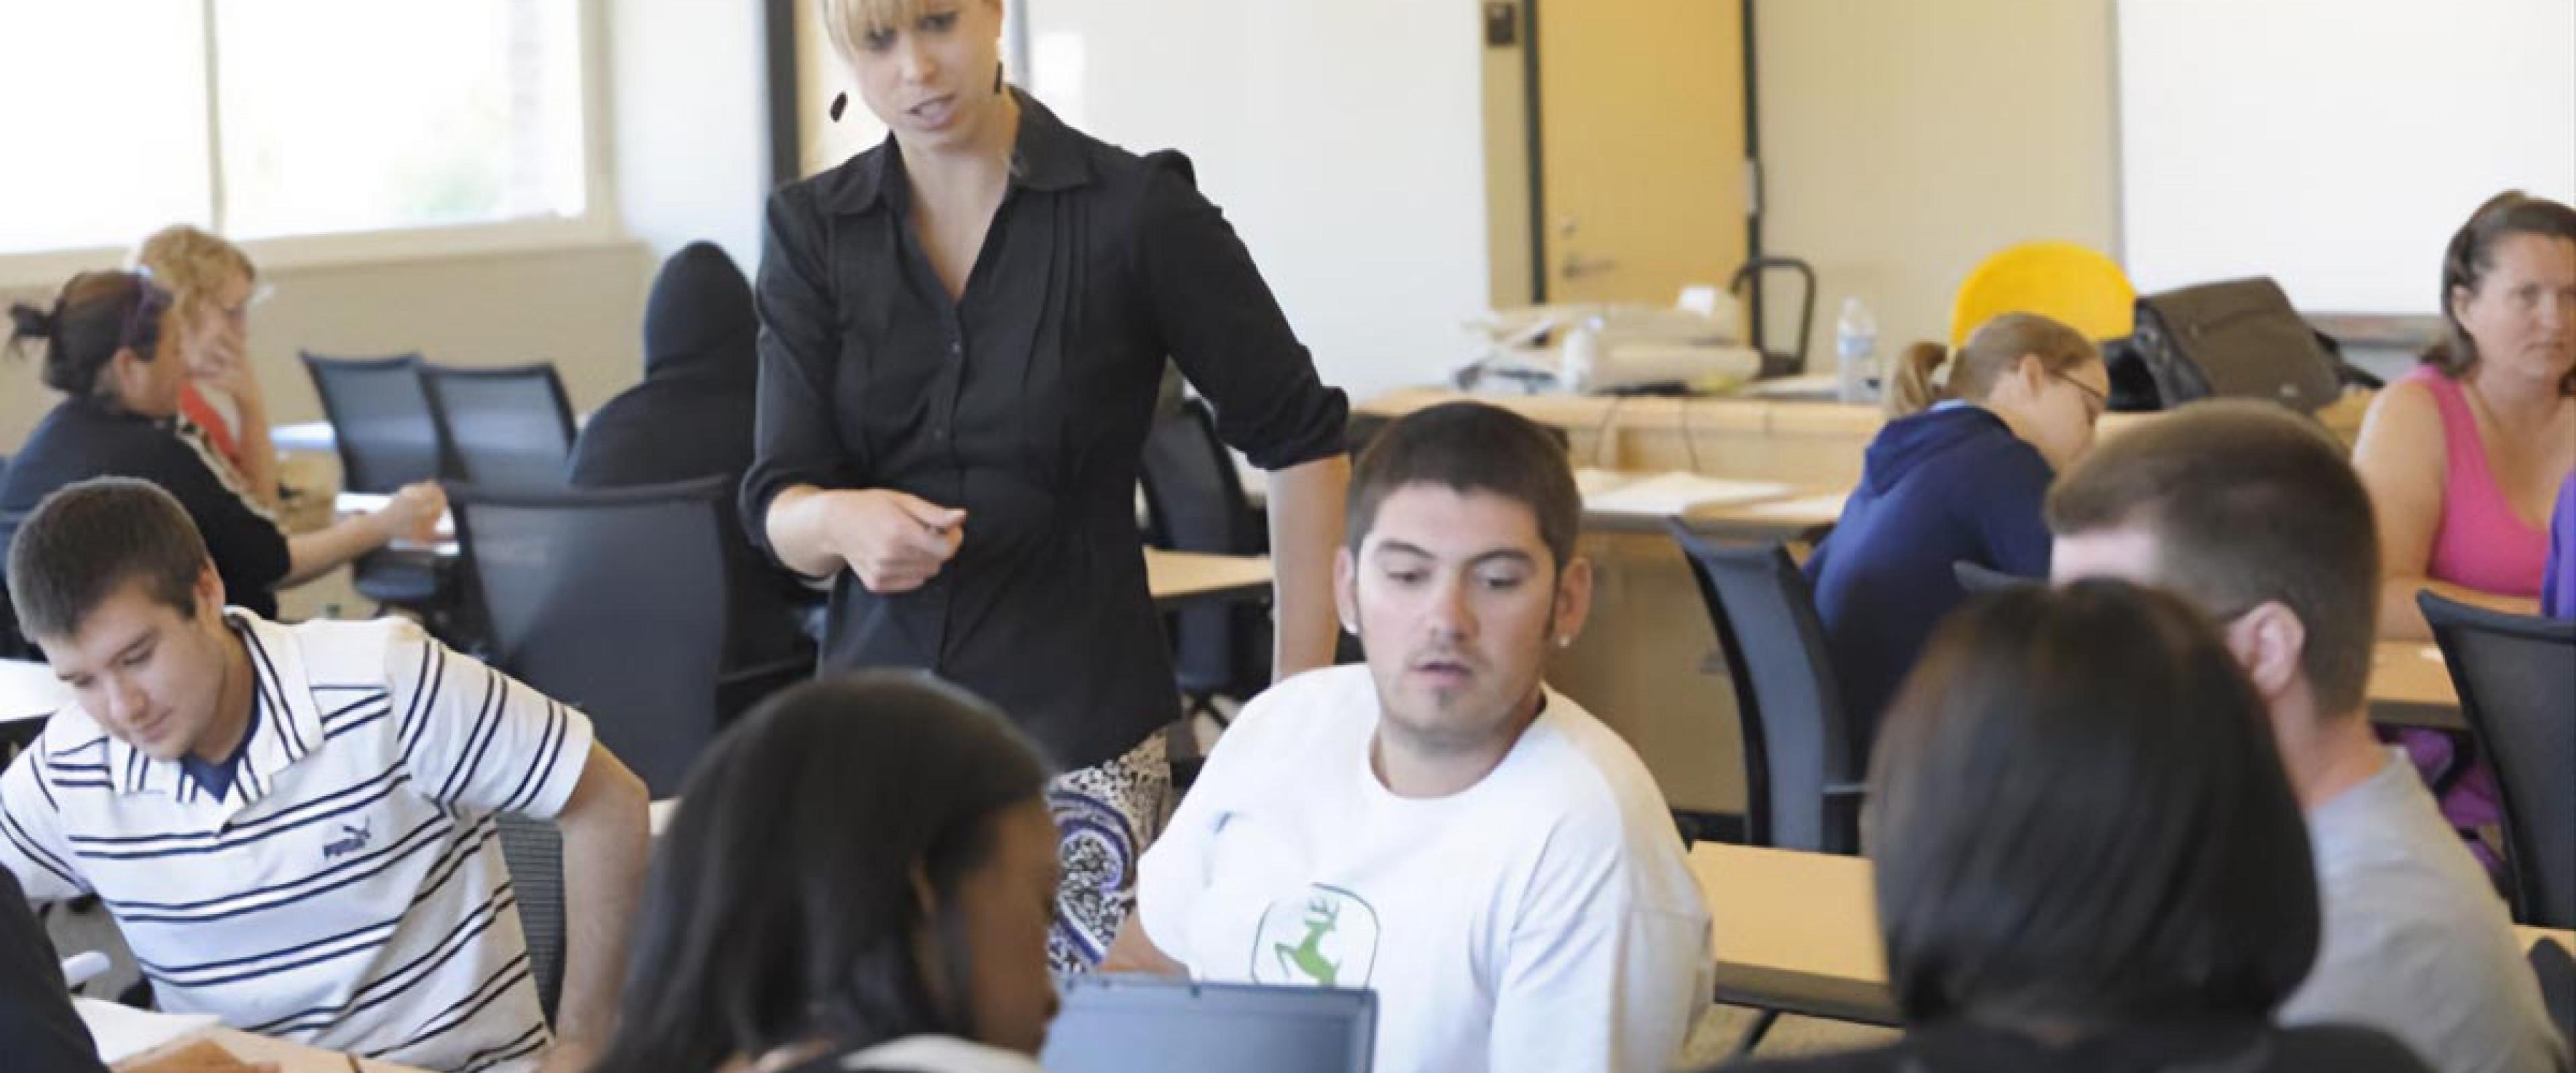 faculty in class